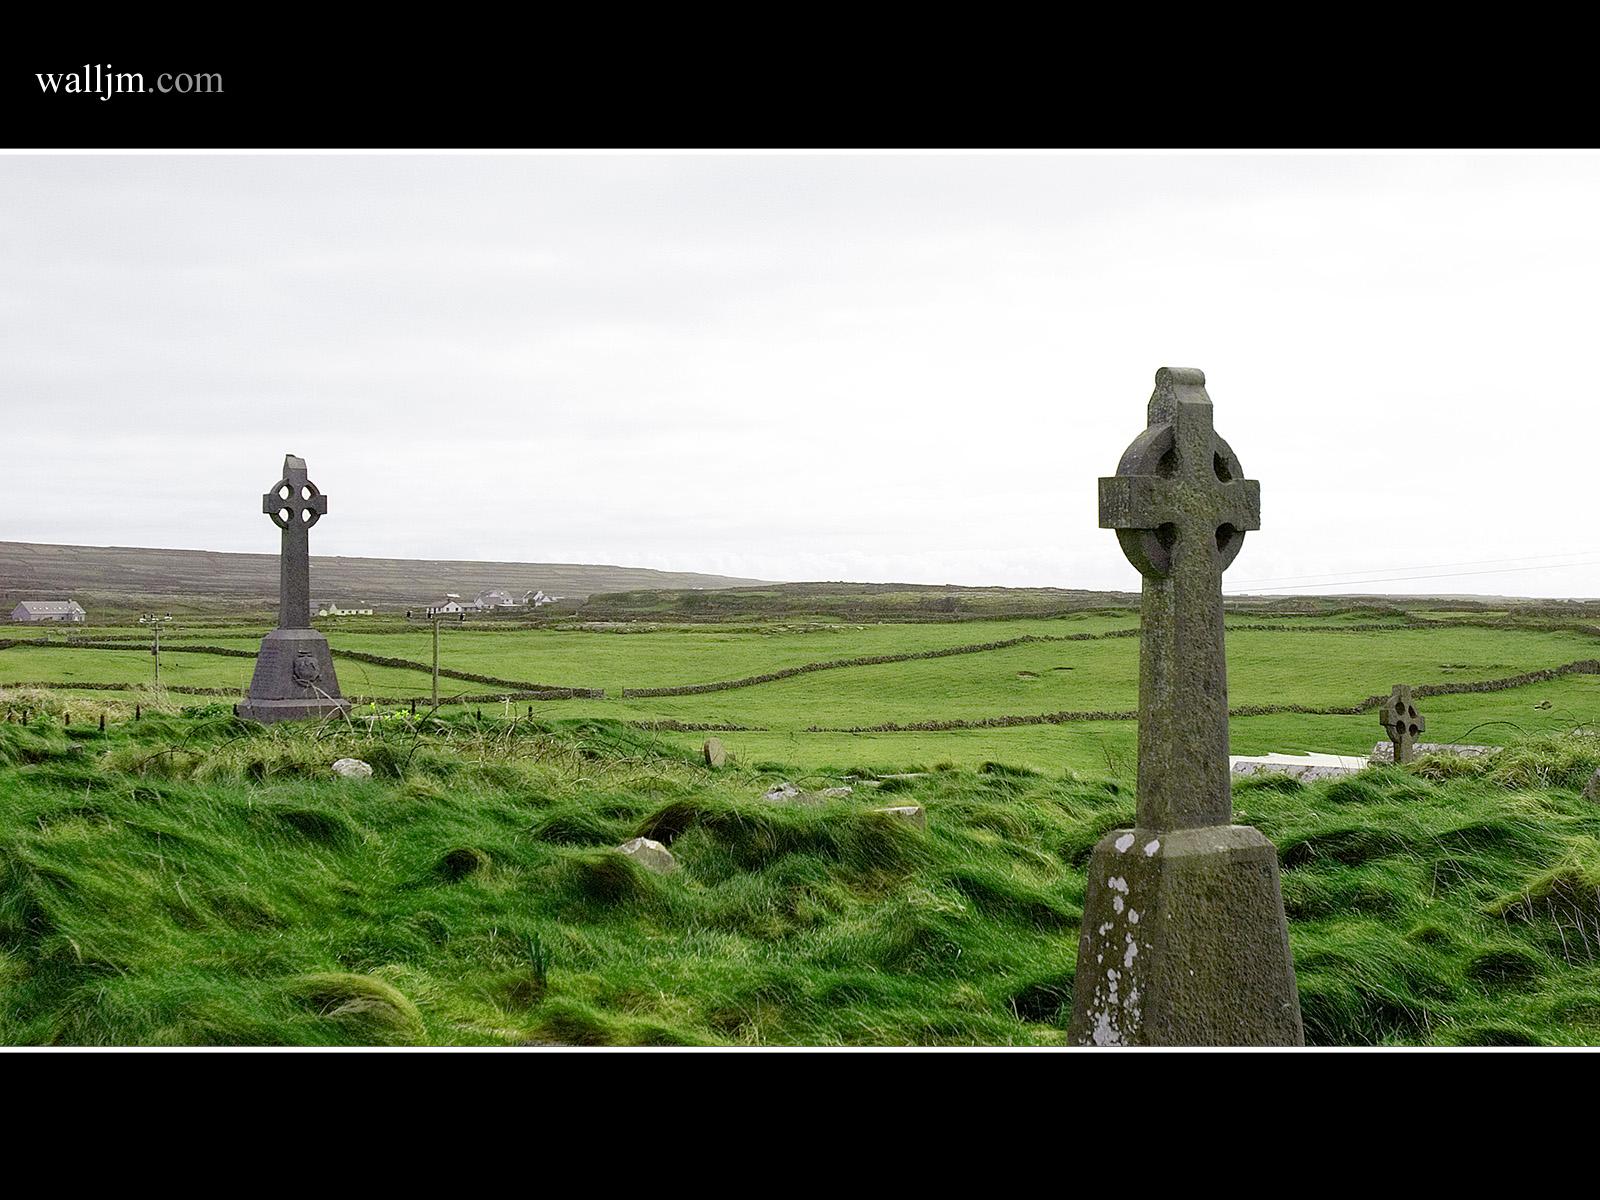 Celtic Cross Wallpaper images 1600x1200